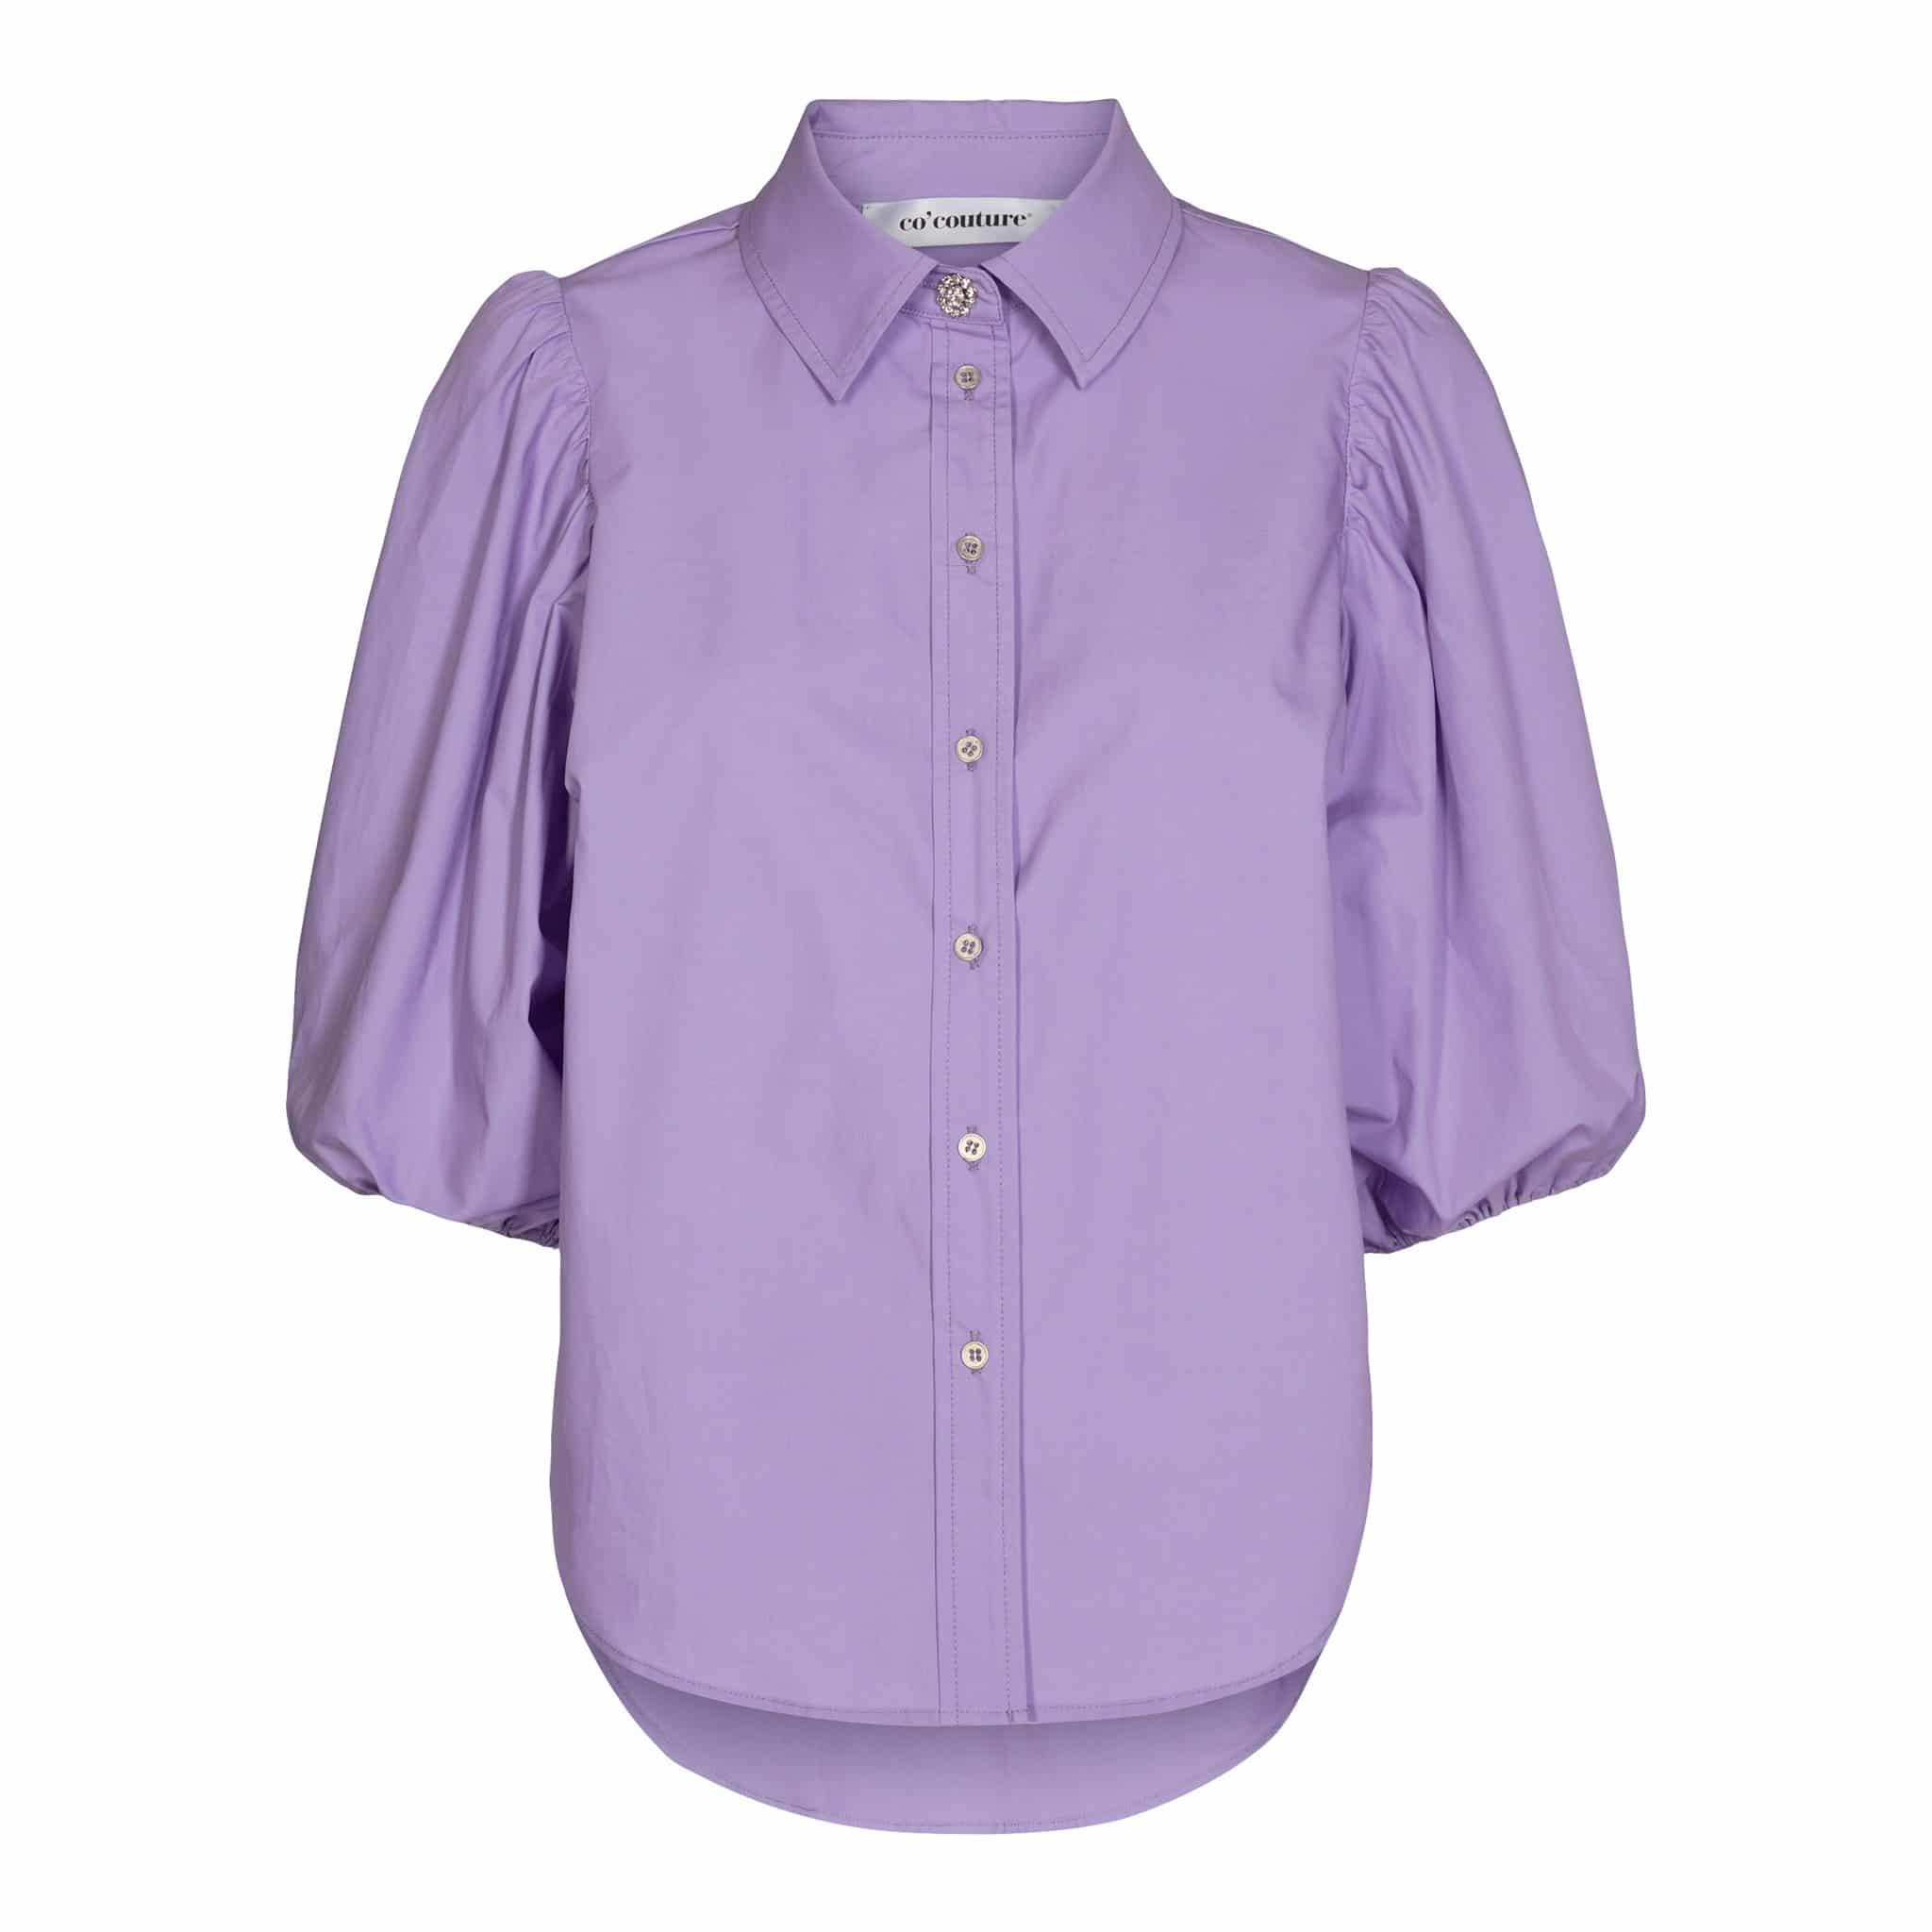 Yates Puff Shirt